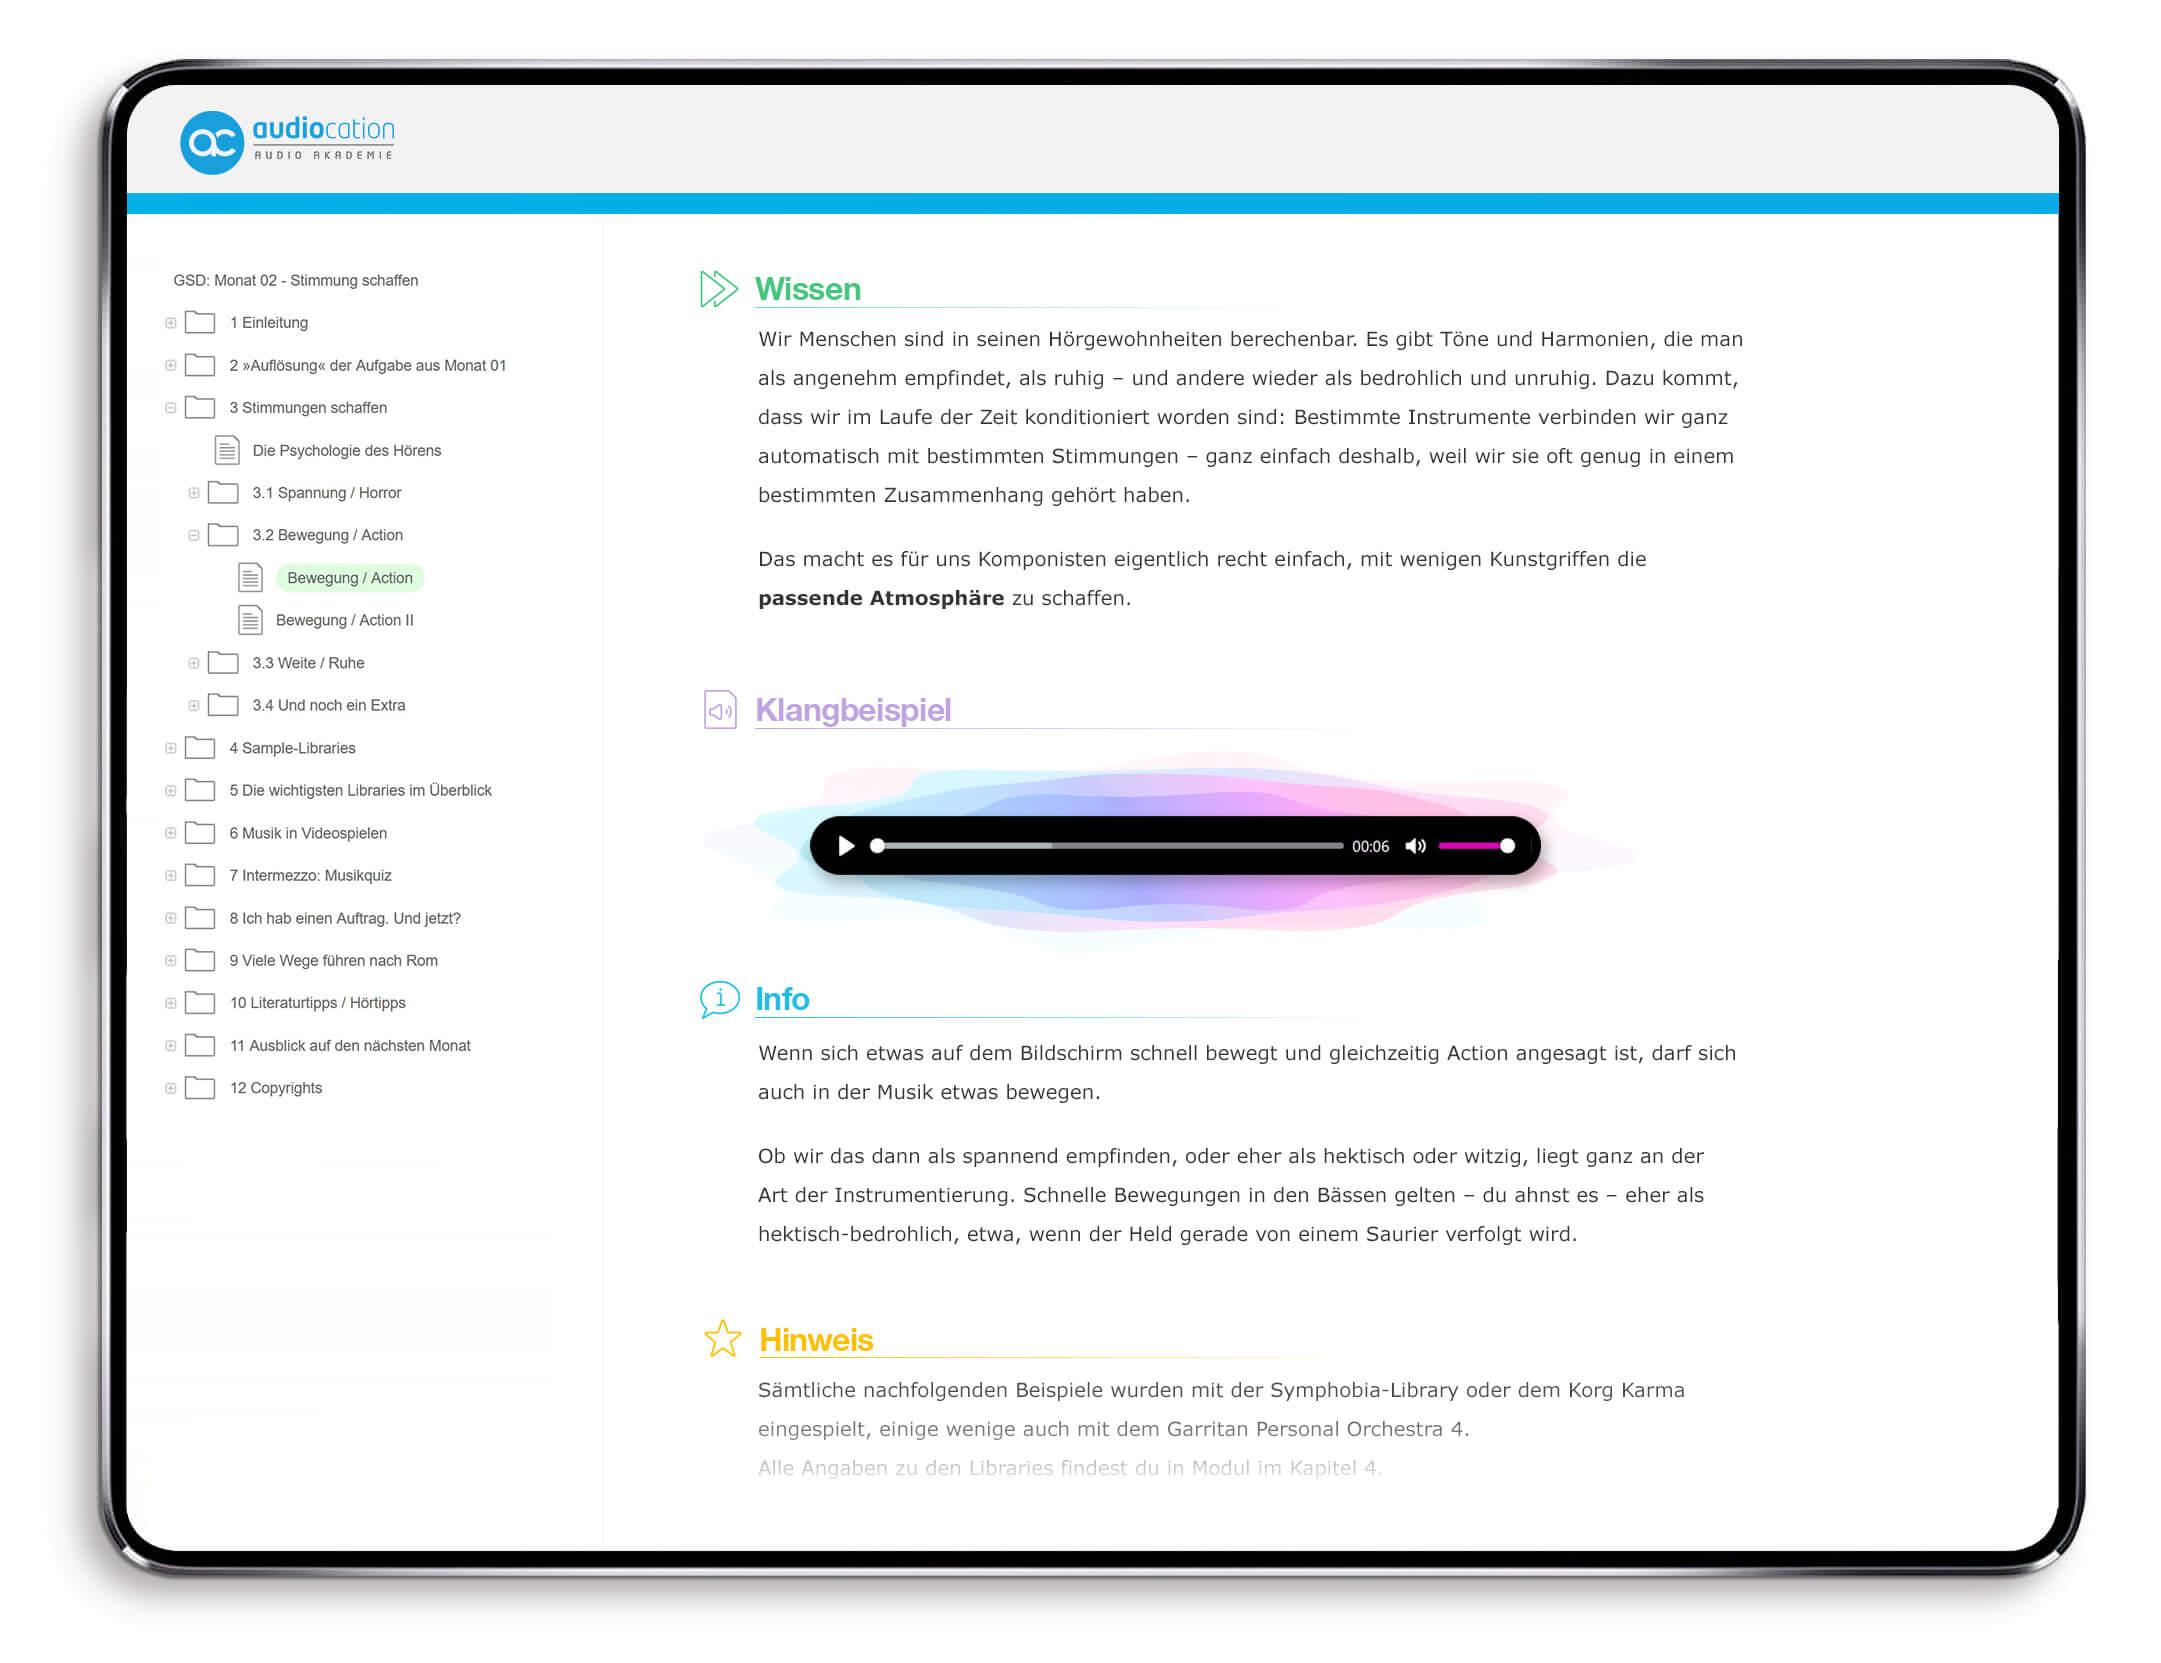 Auszug Game Sound Design Onlinekurs Audiocation